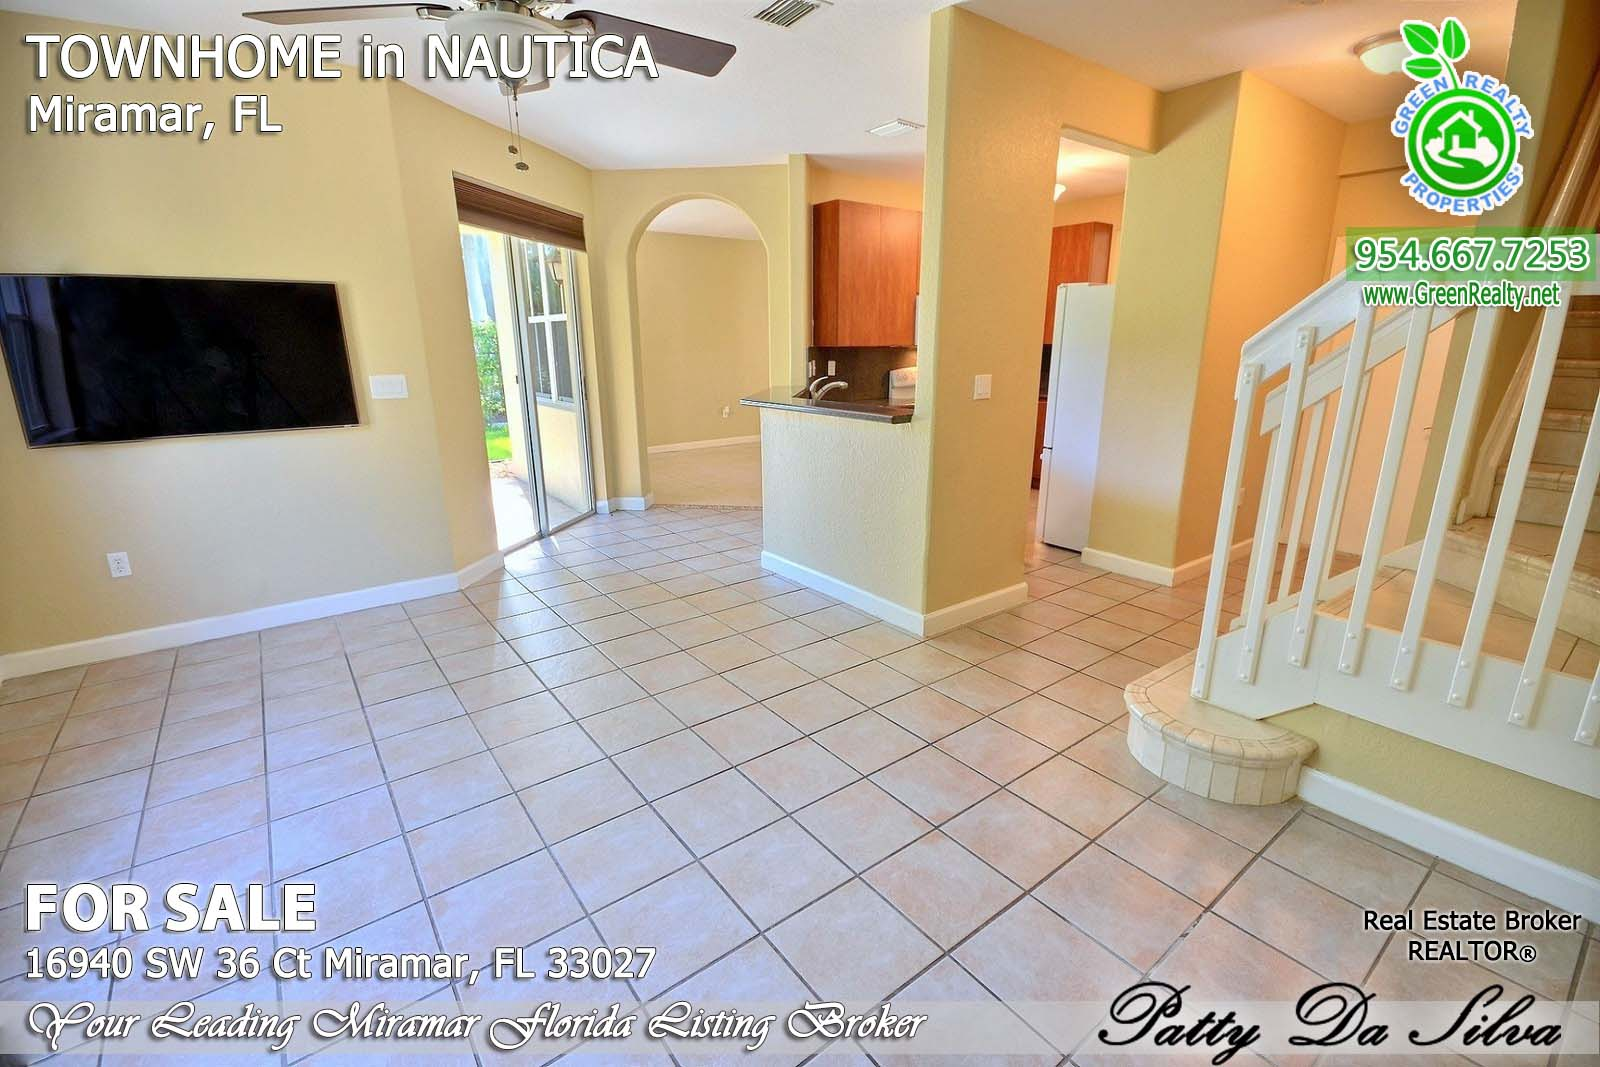 16940 SW 36 Ct Miramar, FL 33027 - Nautica Miramar Homes For Sale (13)